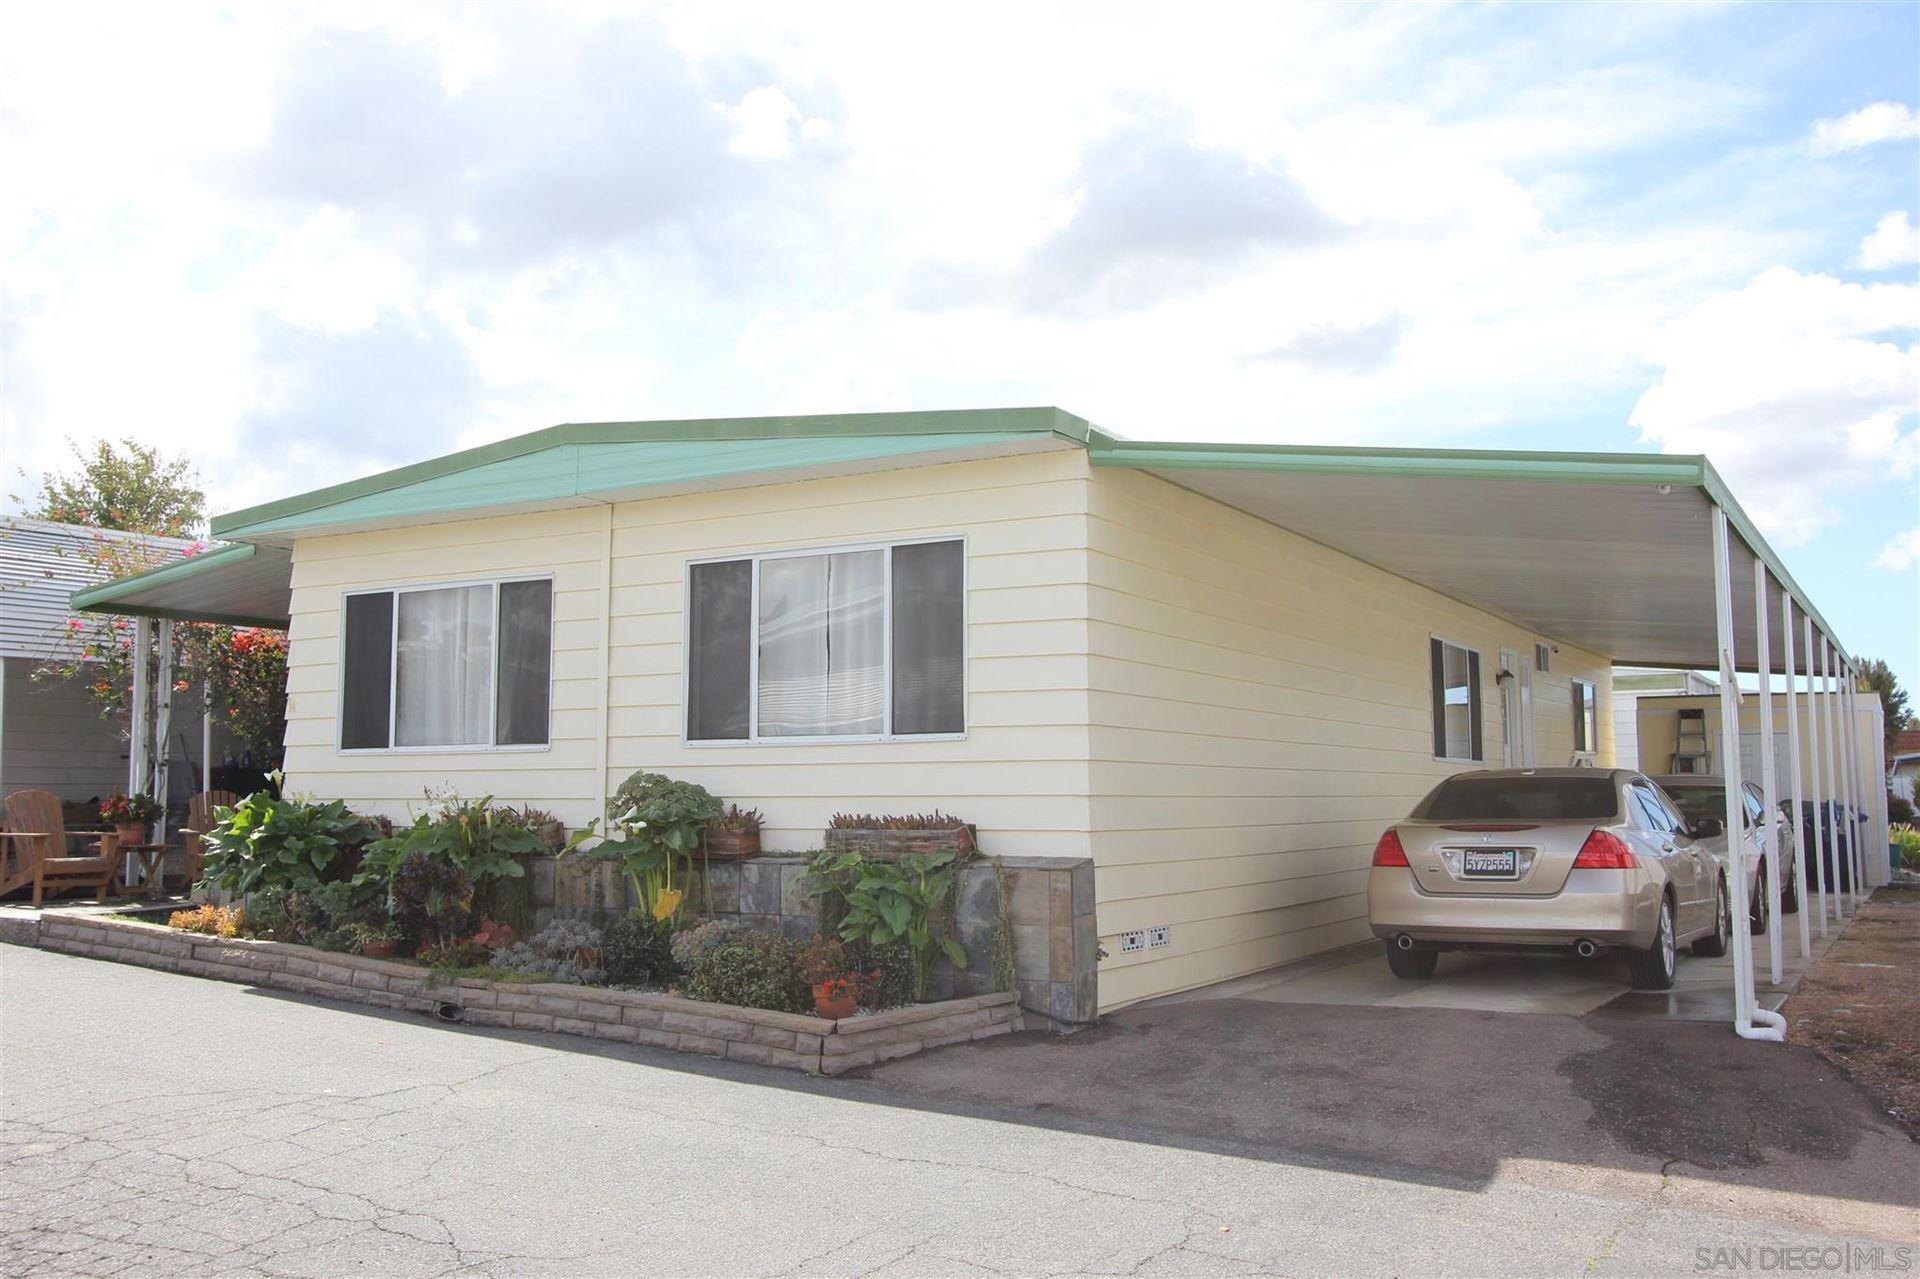 Photo of 718 Sycamore Ave #75, Vista, CA 92083 (MLS # 210006784)